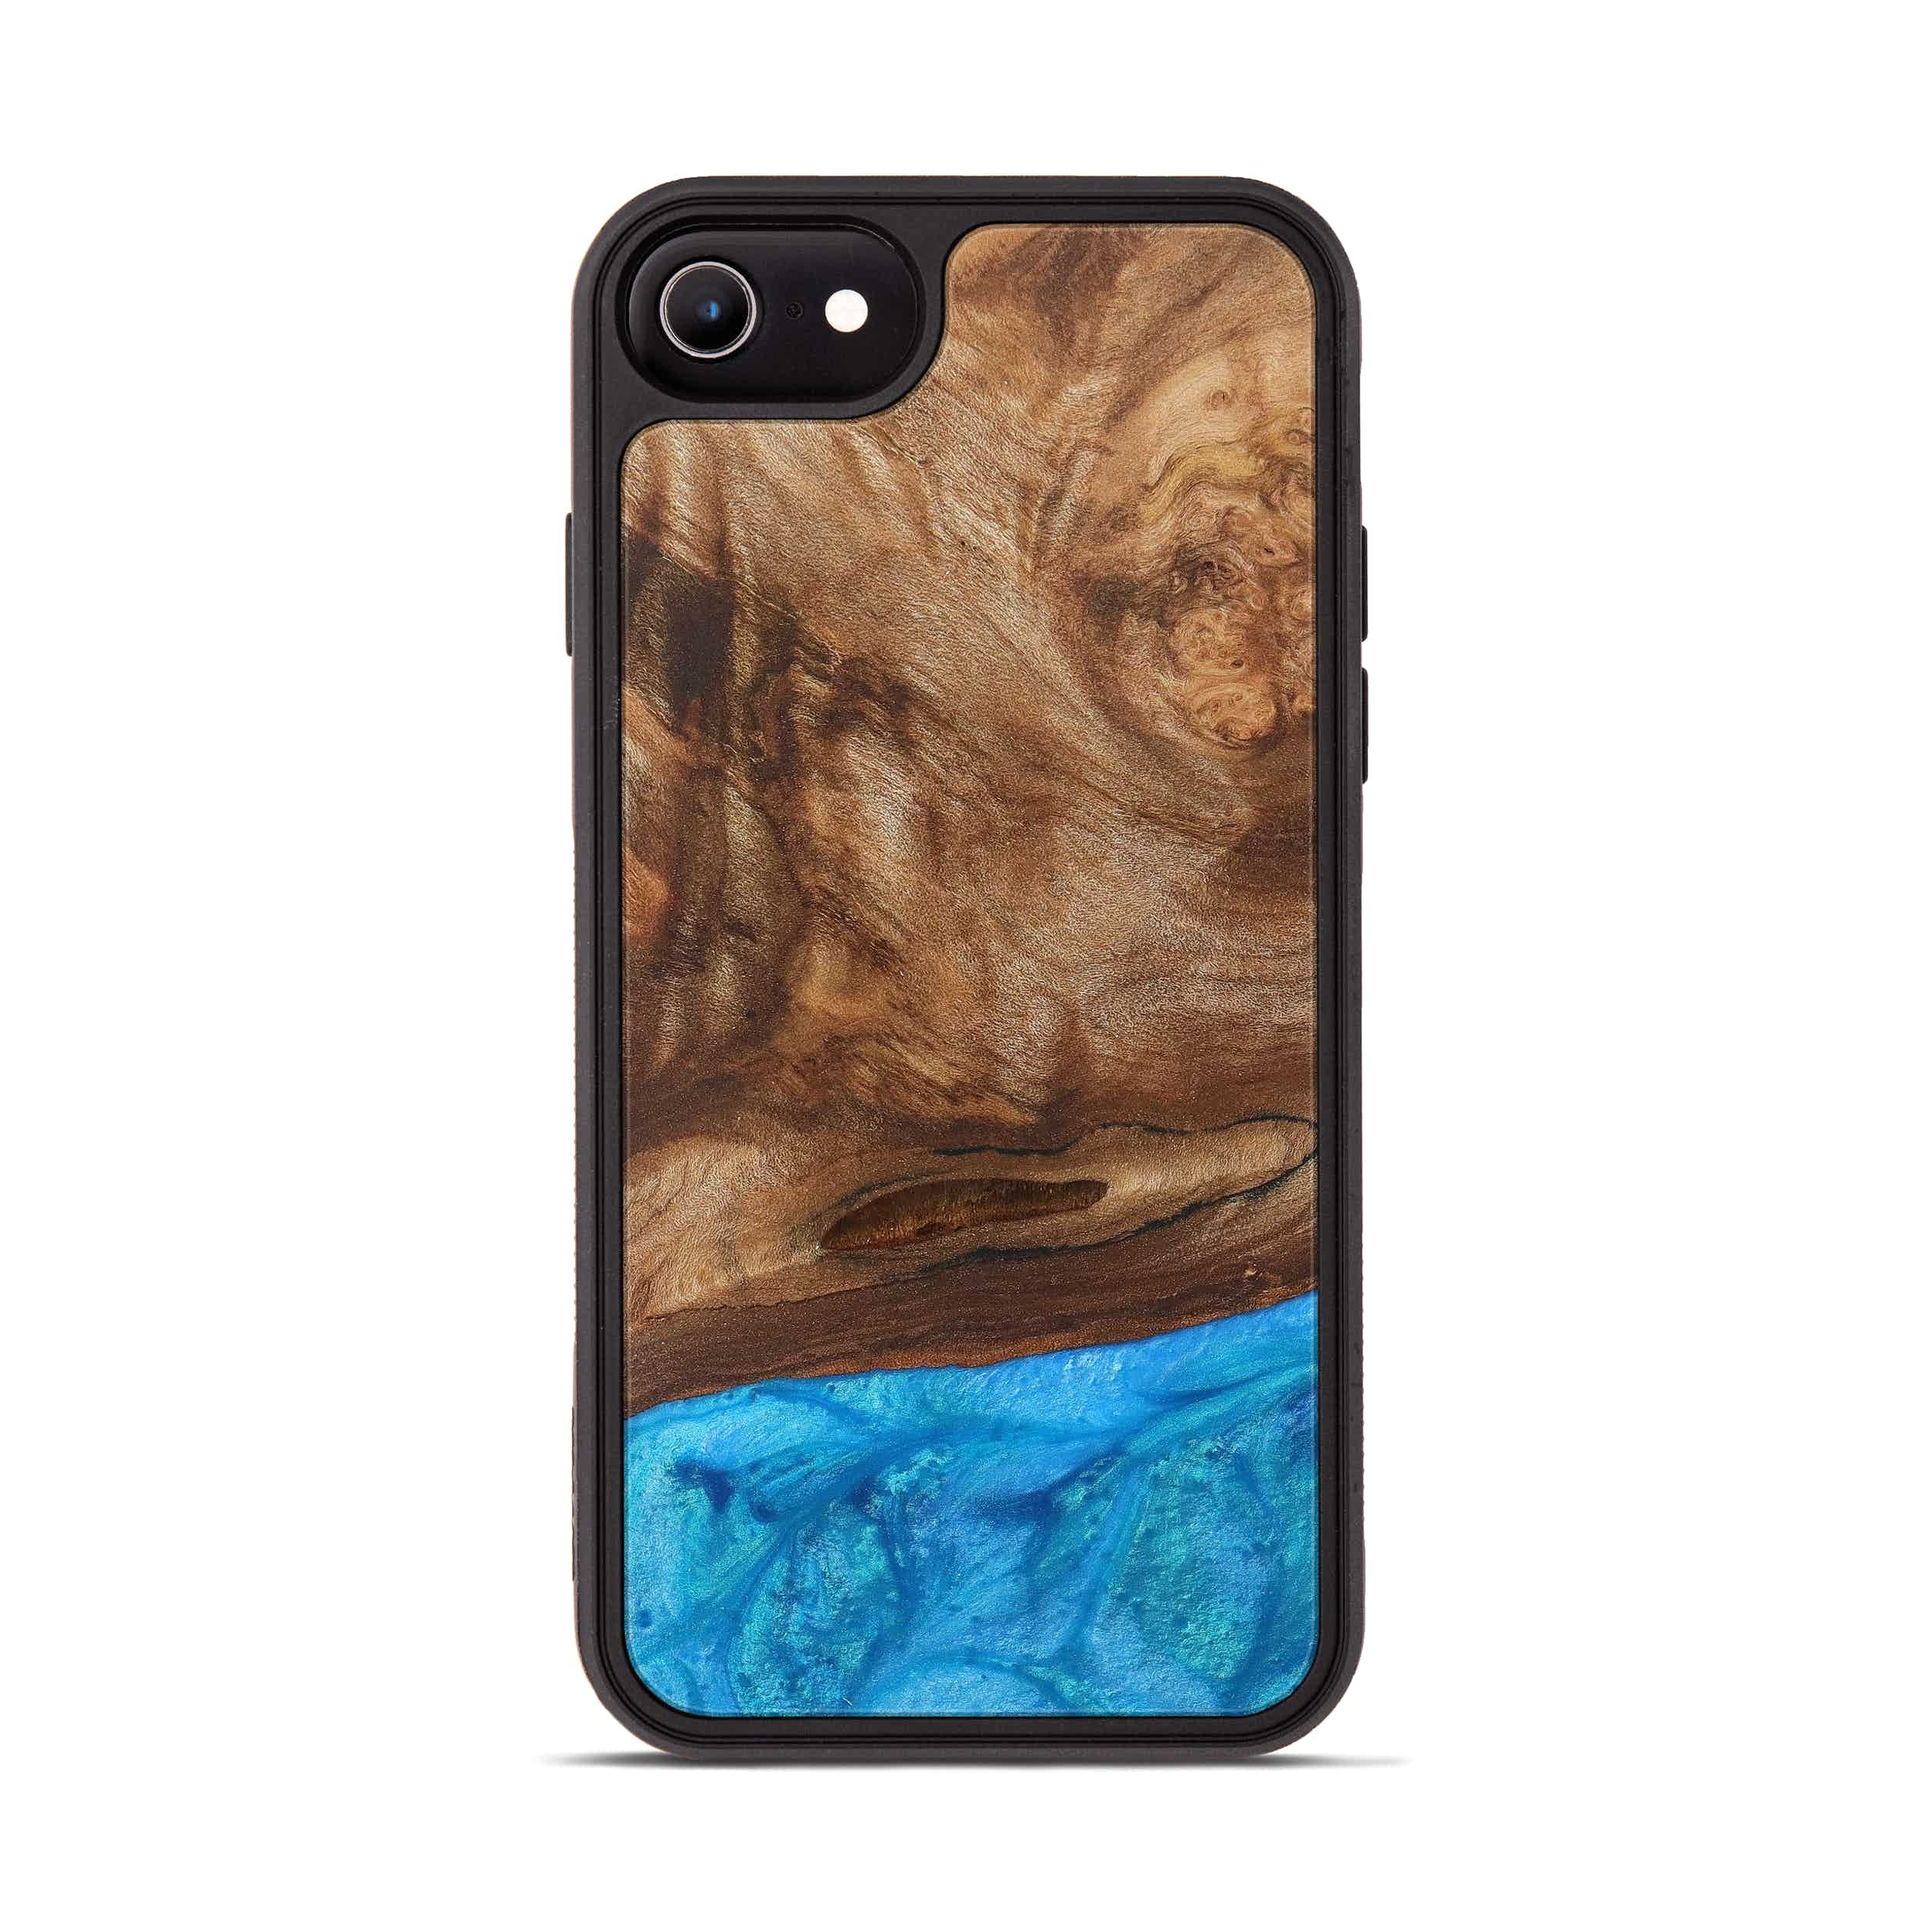 iPhone 6s Wood+Resin Phone Case - Rosamond (Light Blue, 388817)